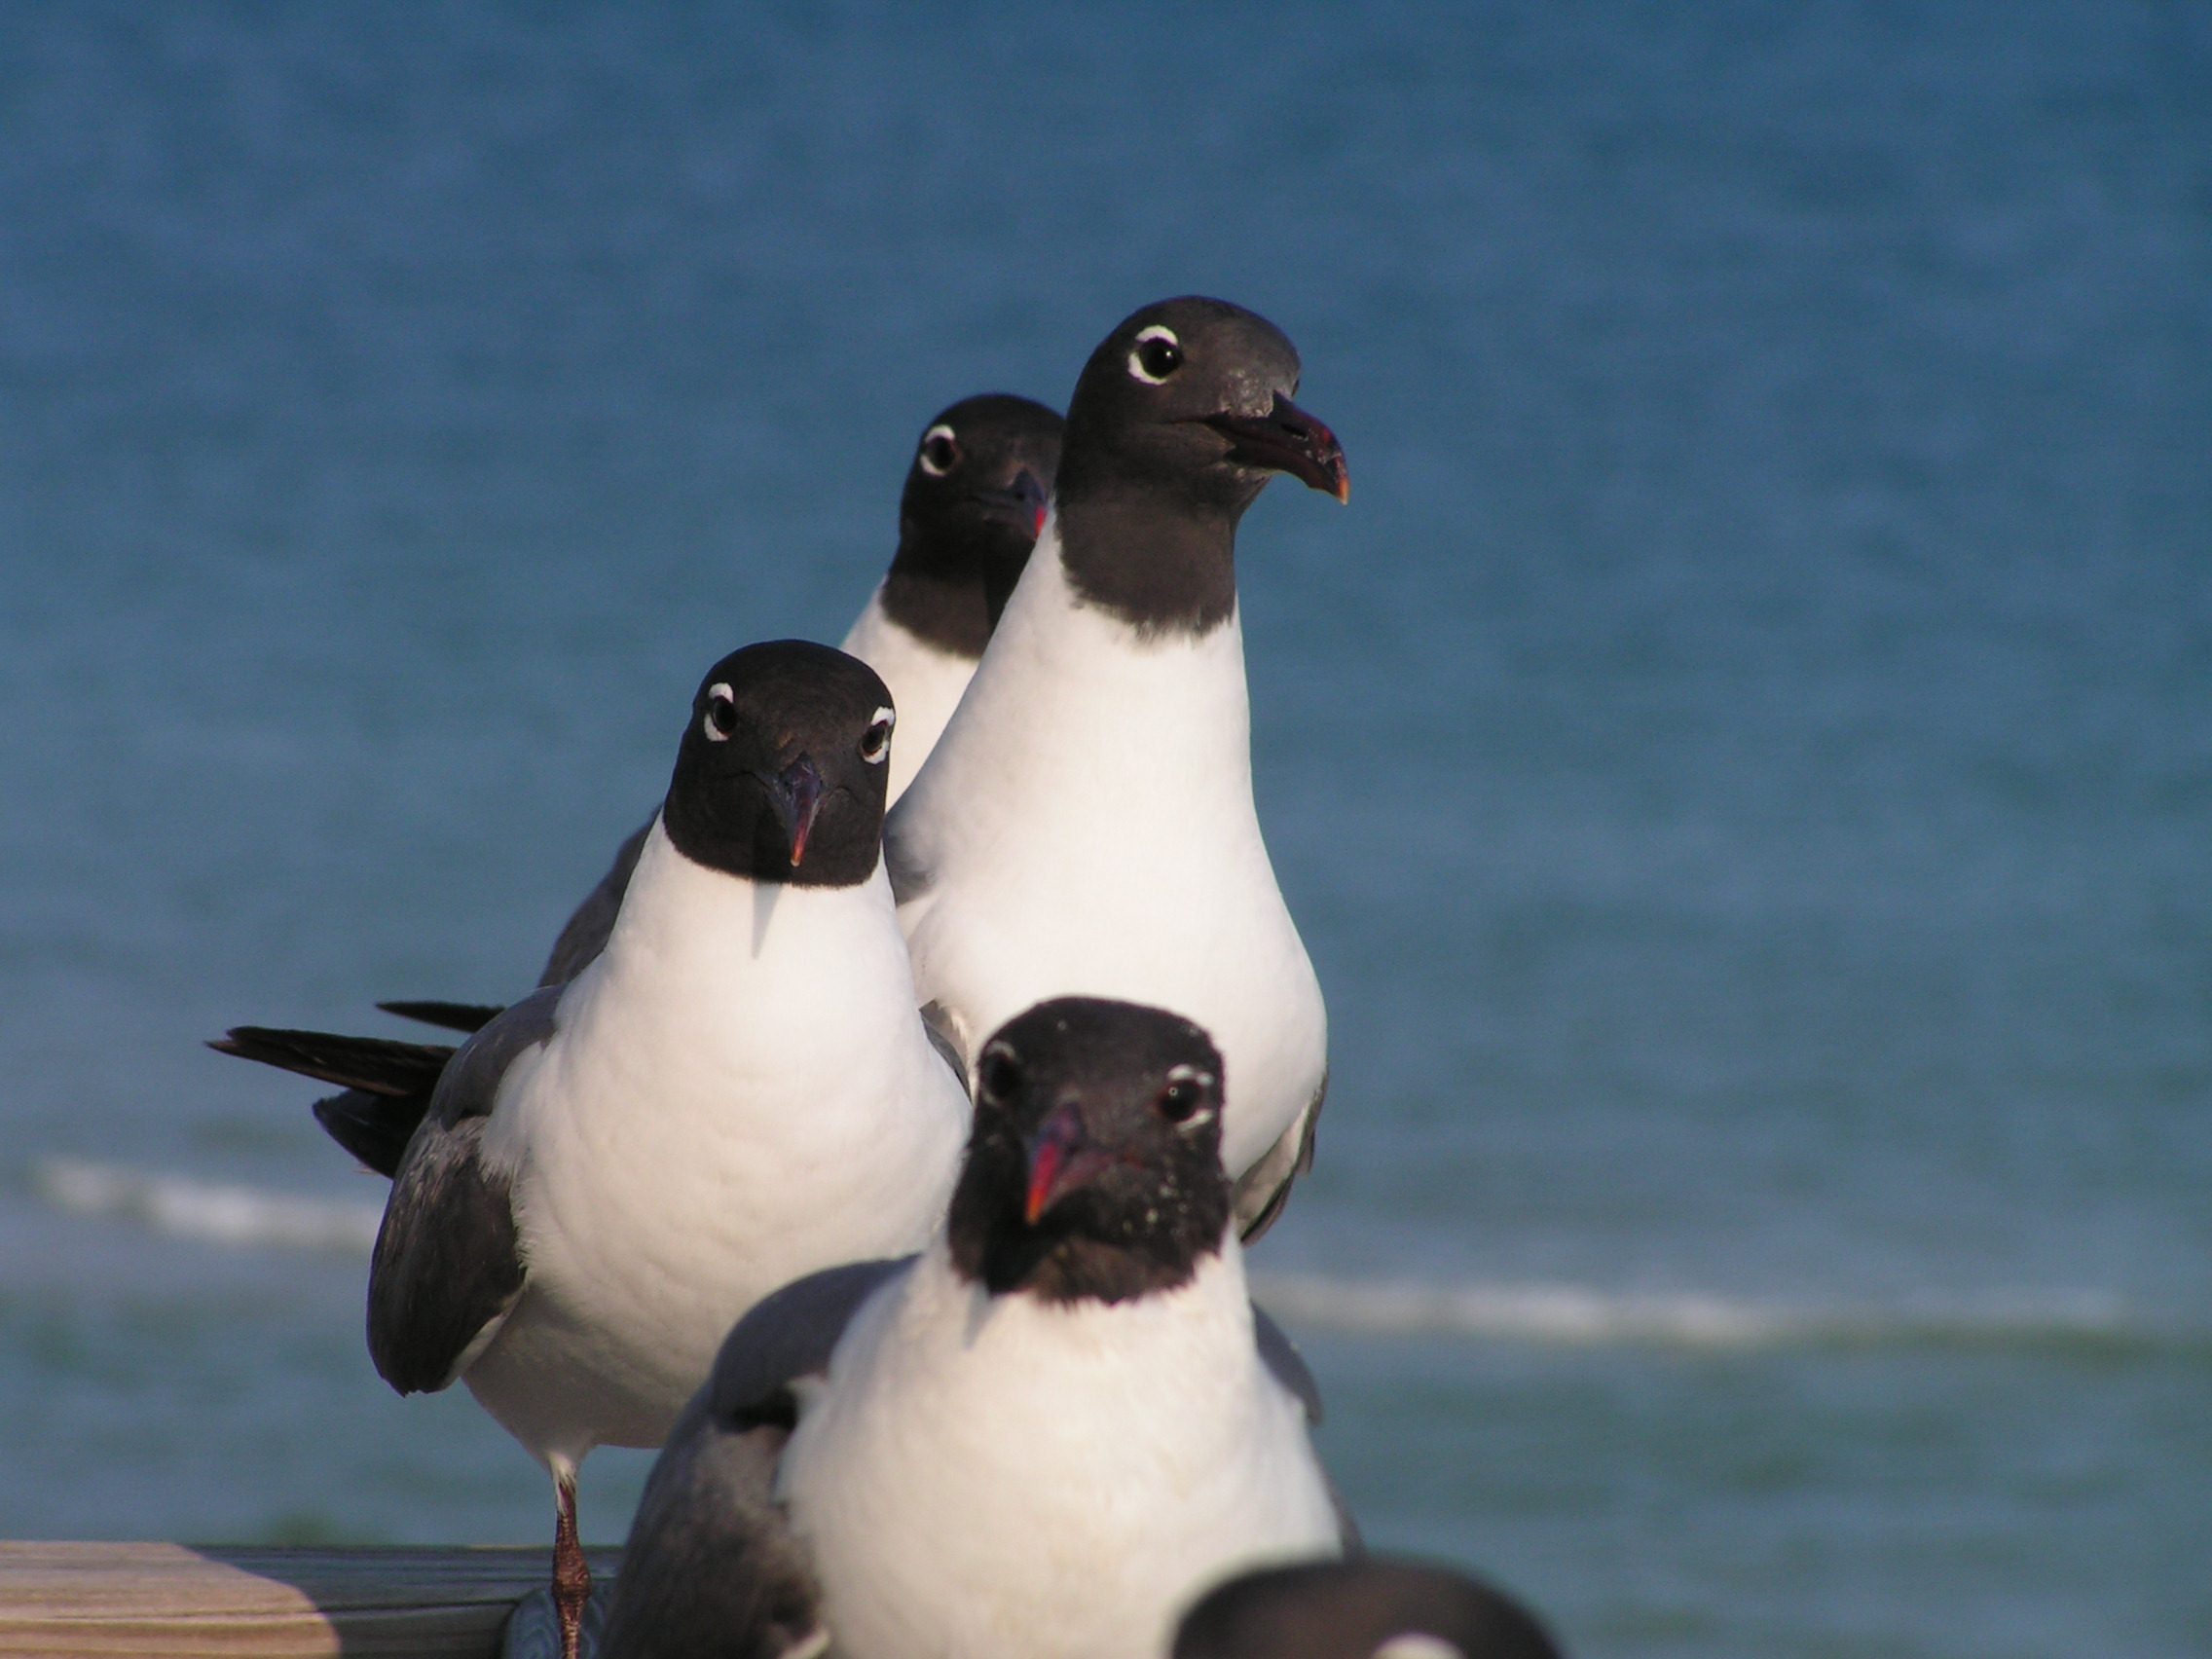 St. George Island hosts many types of seabirds - like these photogenic sea gulls!